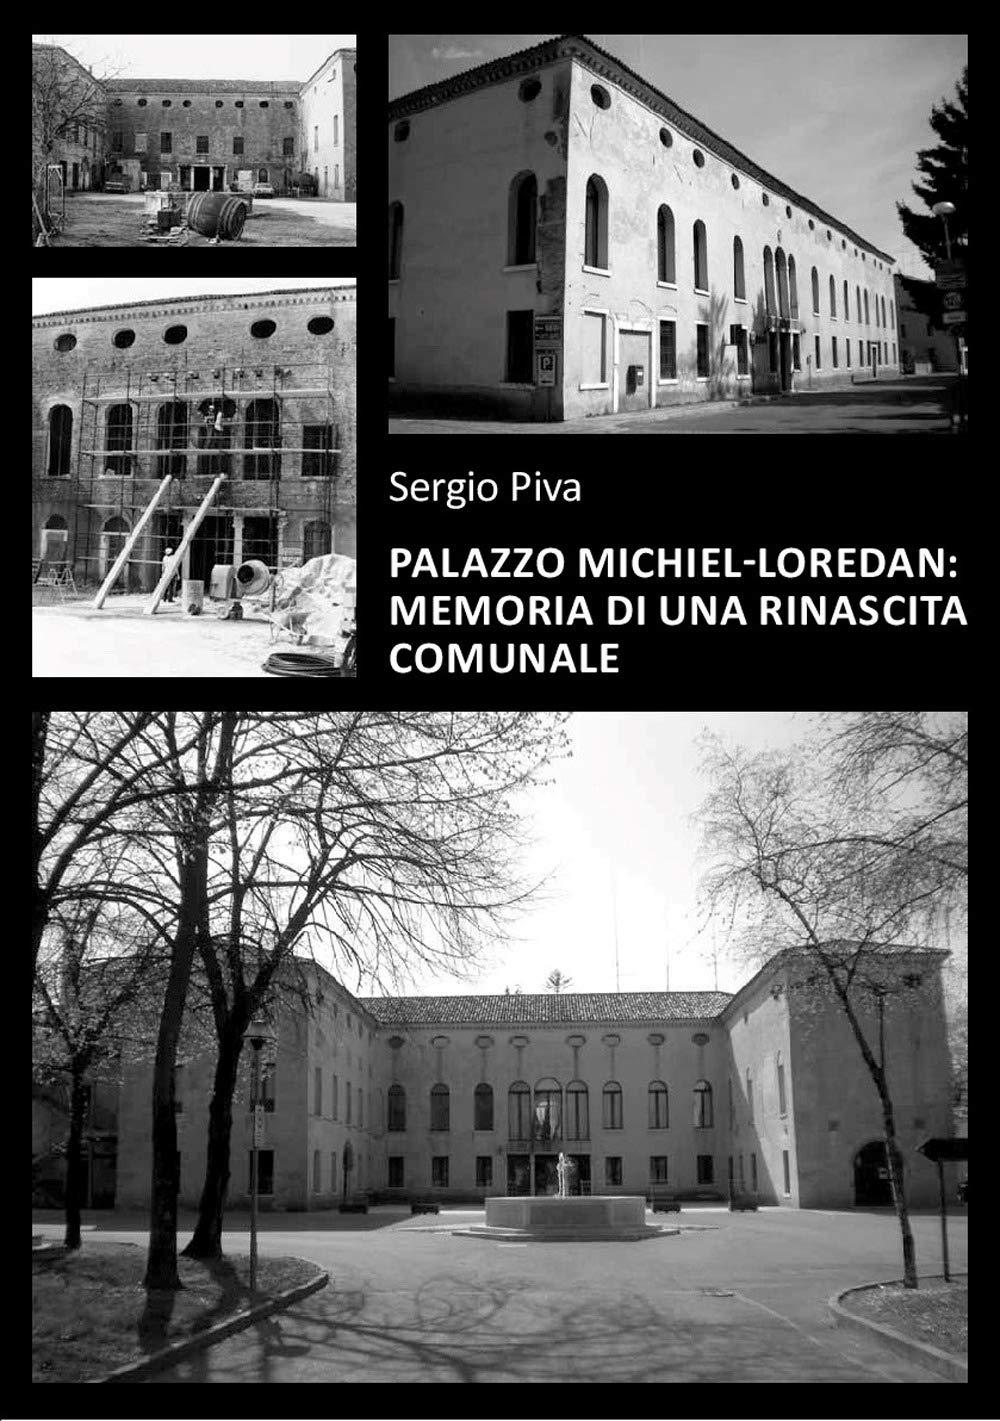 Palazzo Michiel Loredan